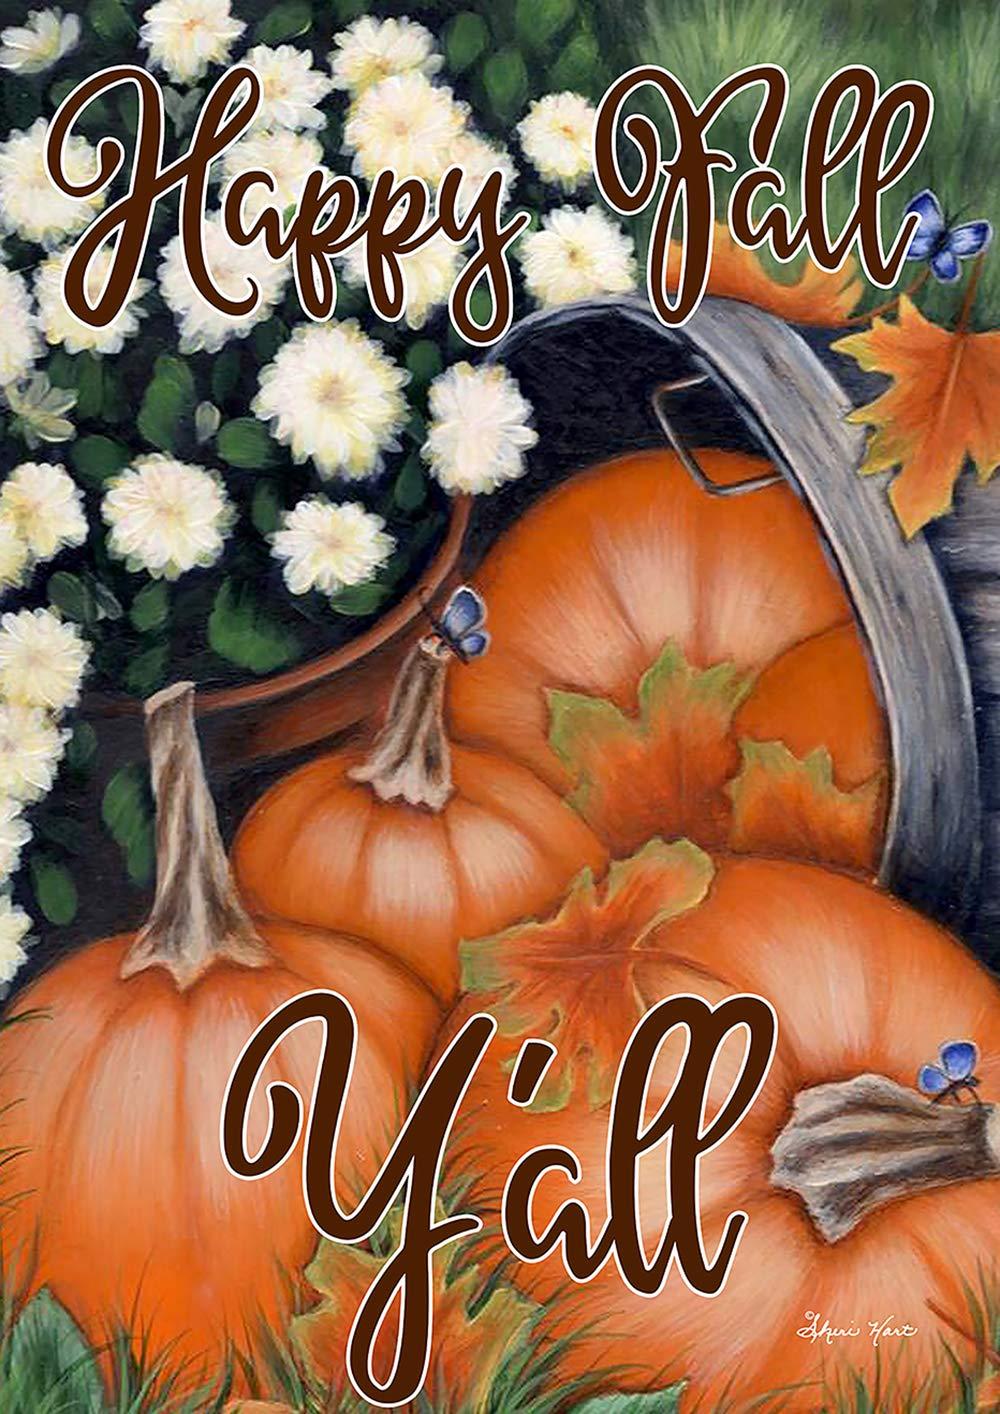 Toland Home Garden 1012205 Pumpkin Bunch 28 x 40 inch Decorative, Fall Autumn Happy Fall Y'all, House Flag